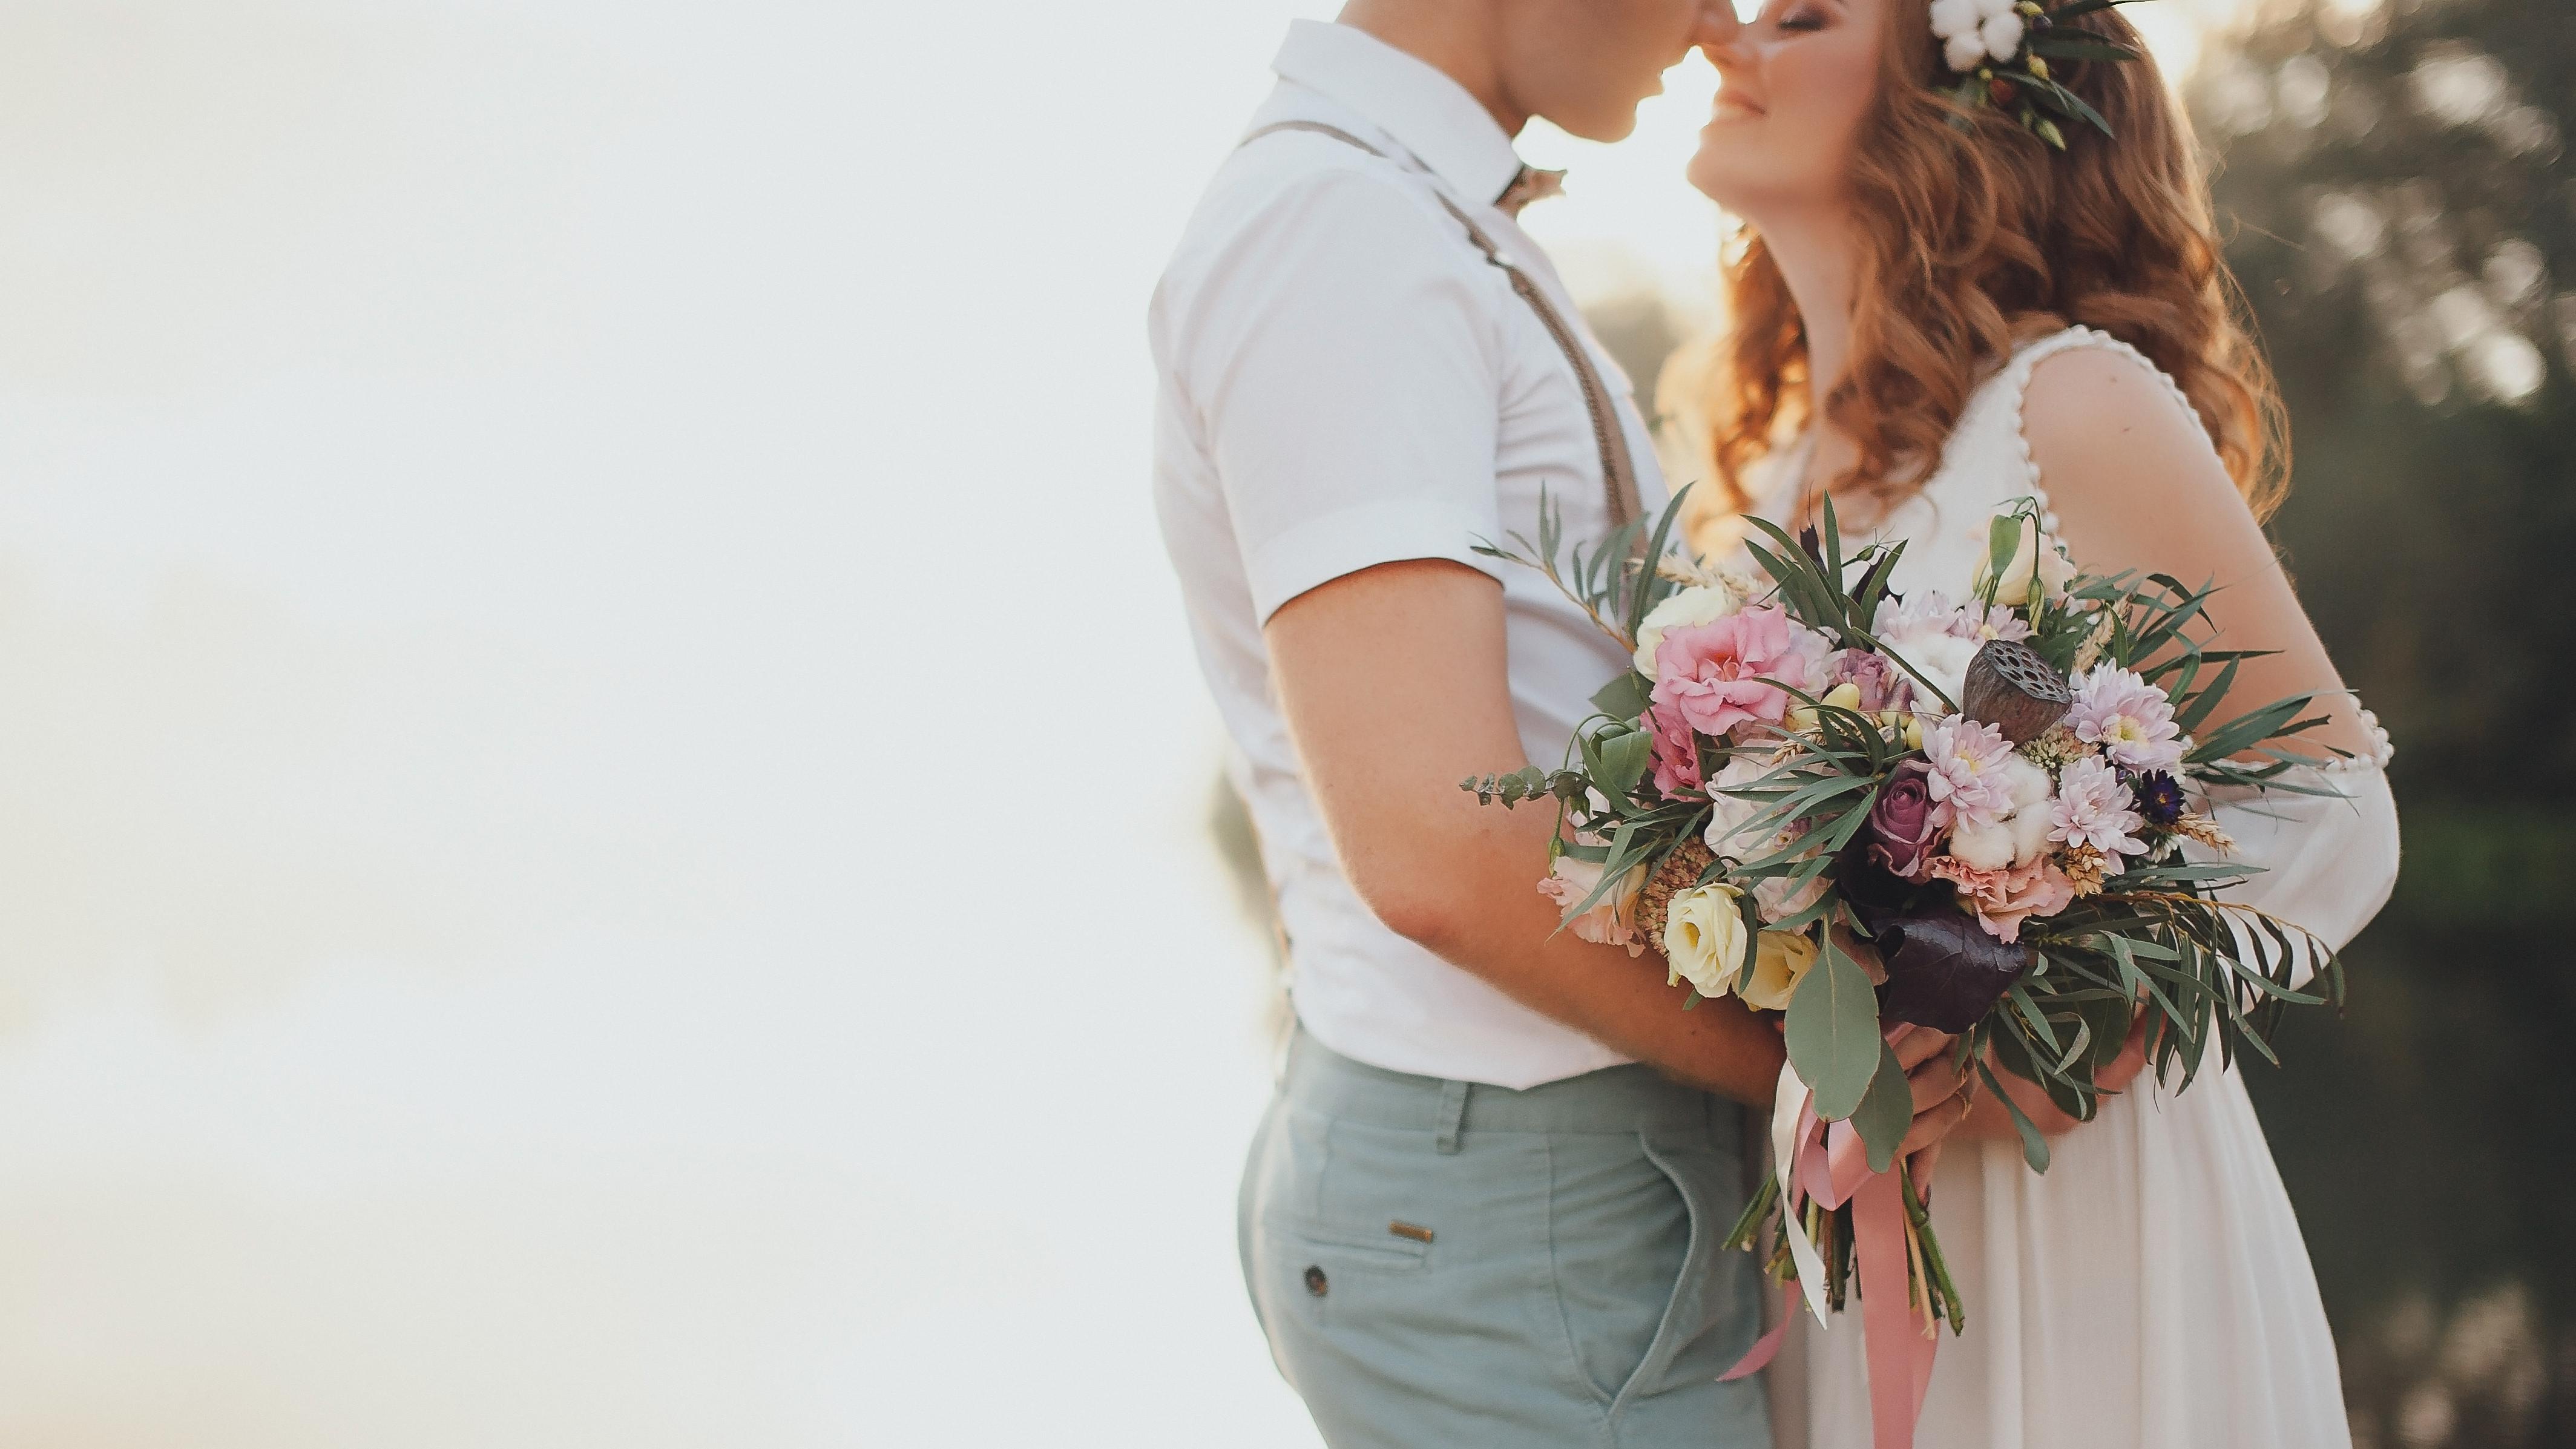 Follow up wedding consultation